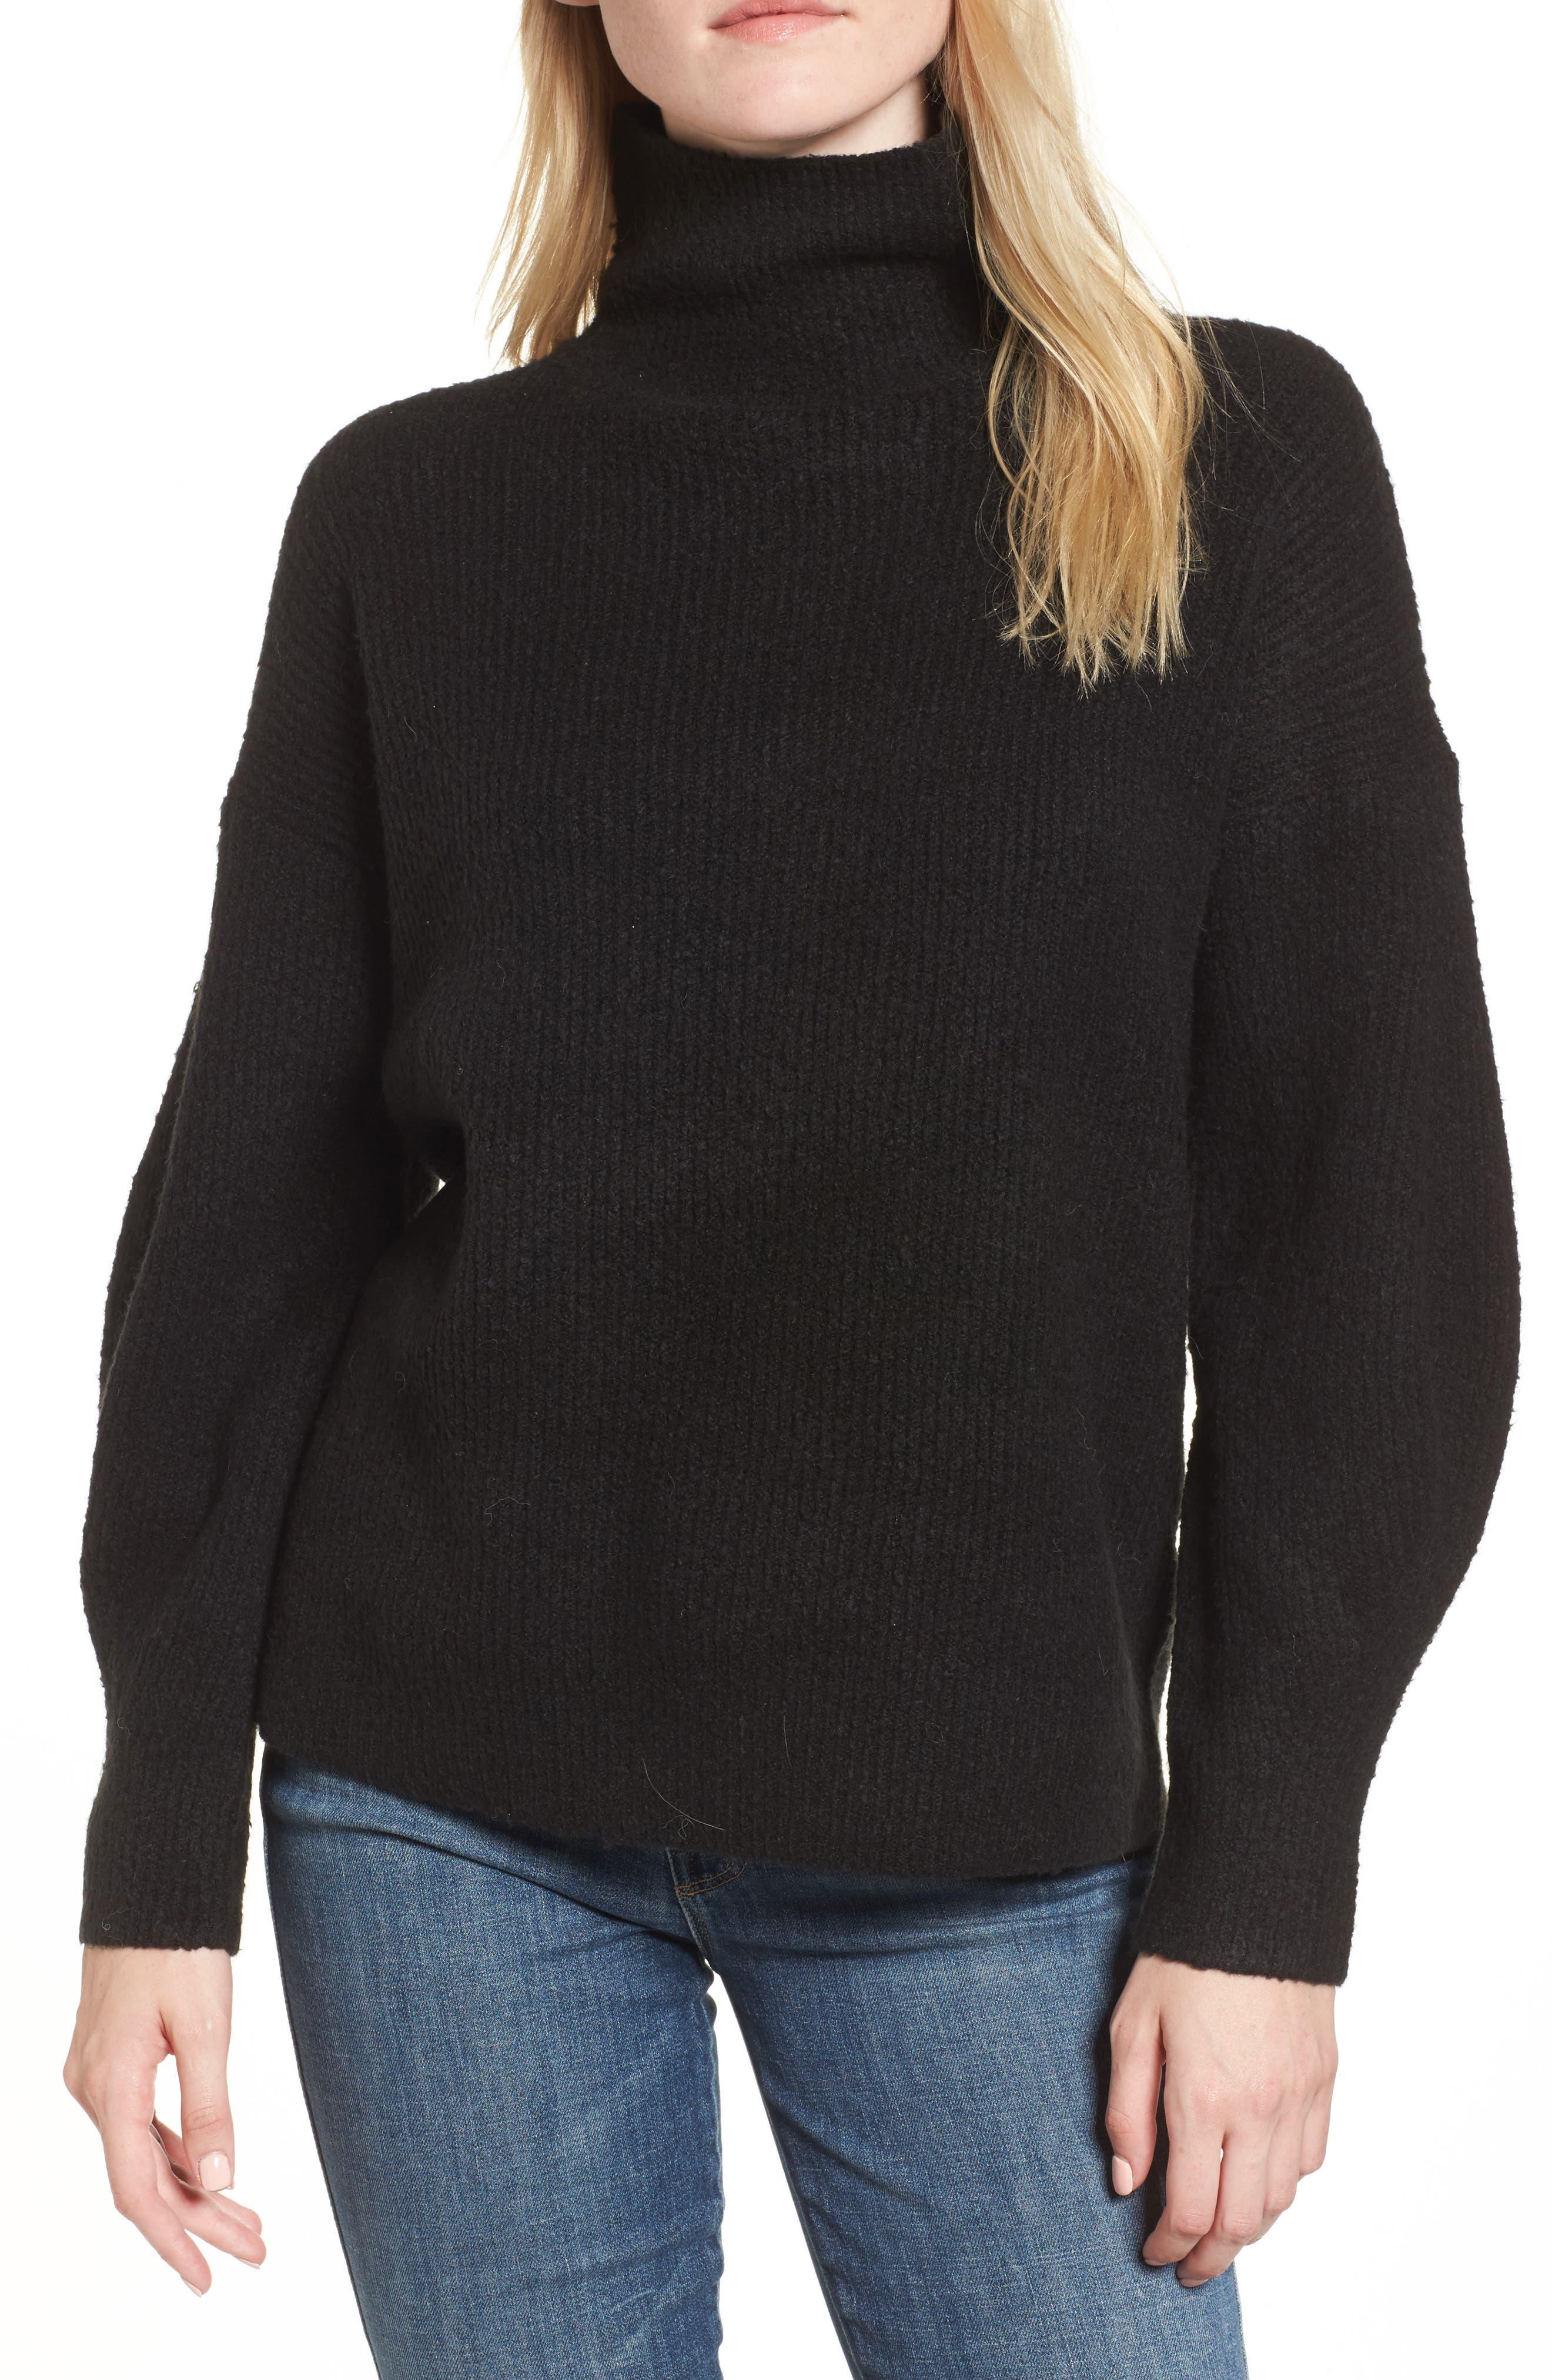 Urban Flossy Turtleneck Sweater,                         Main,                         color, 001